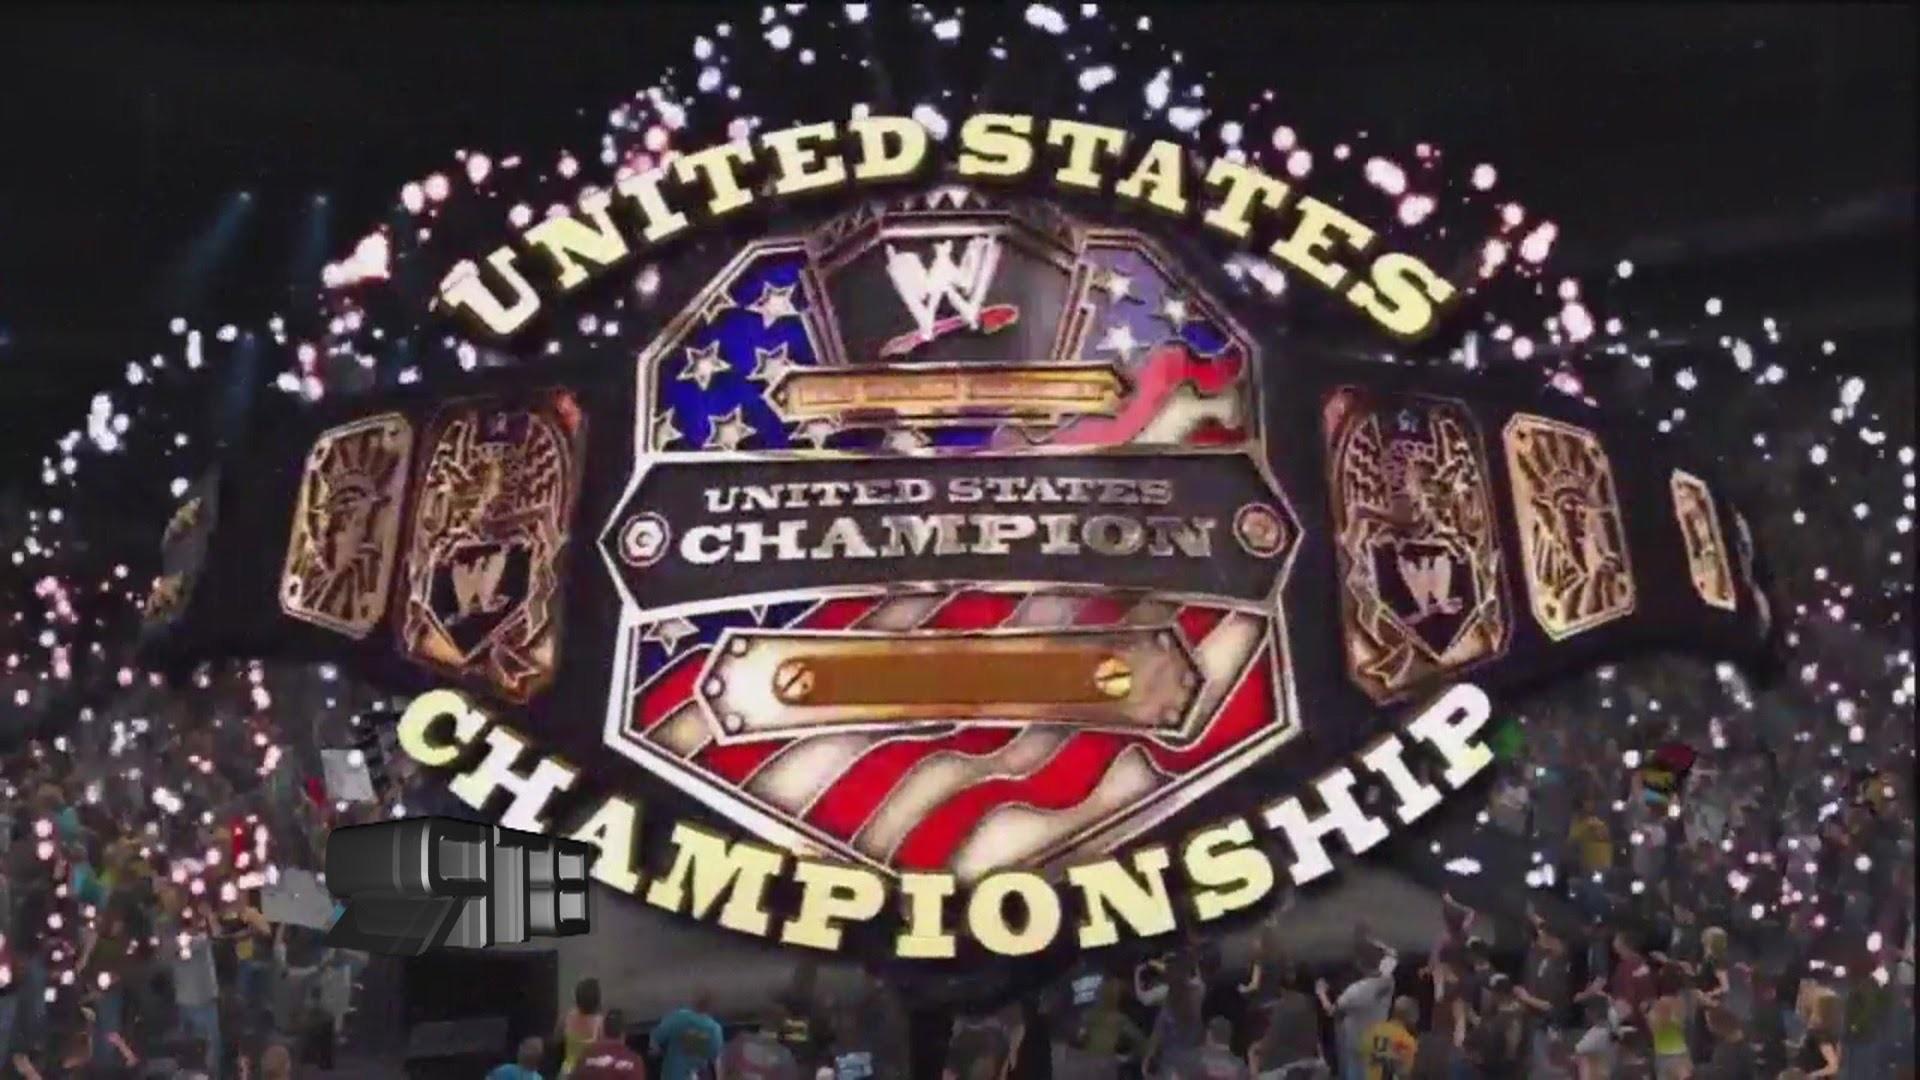 1920x1080 WWE Payback 2014 Predictions Sheamus vs Cesaro WWE United States Championship(WWE 2K14)